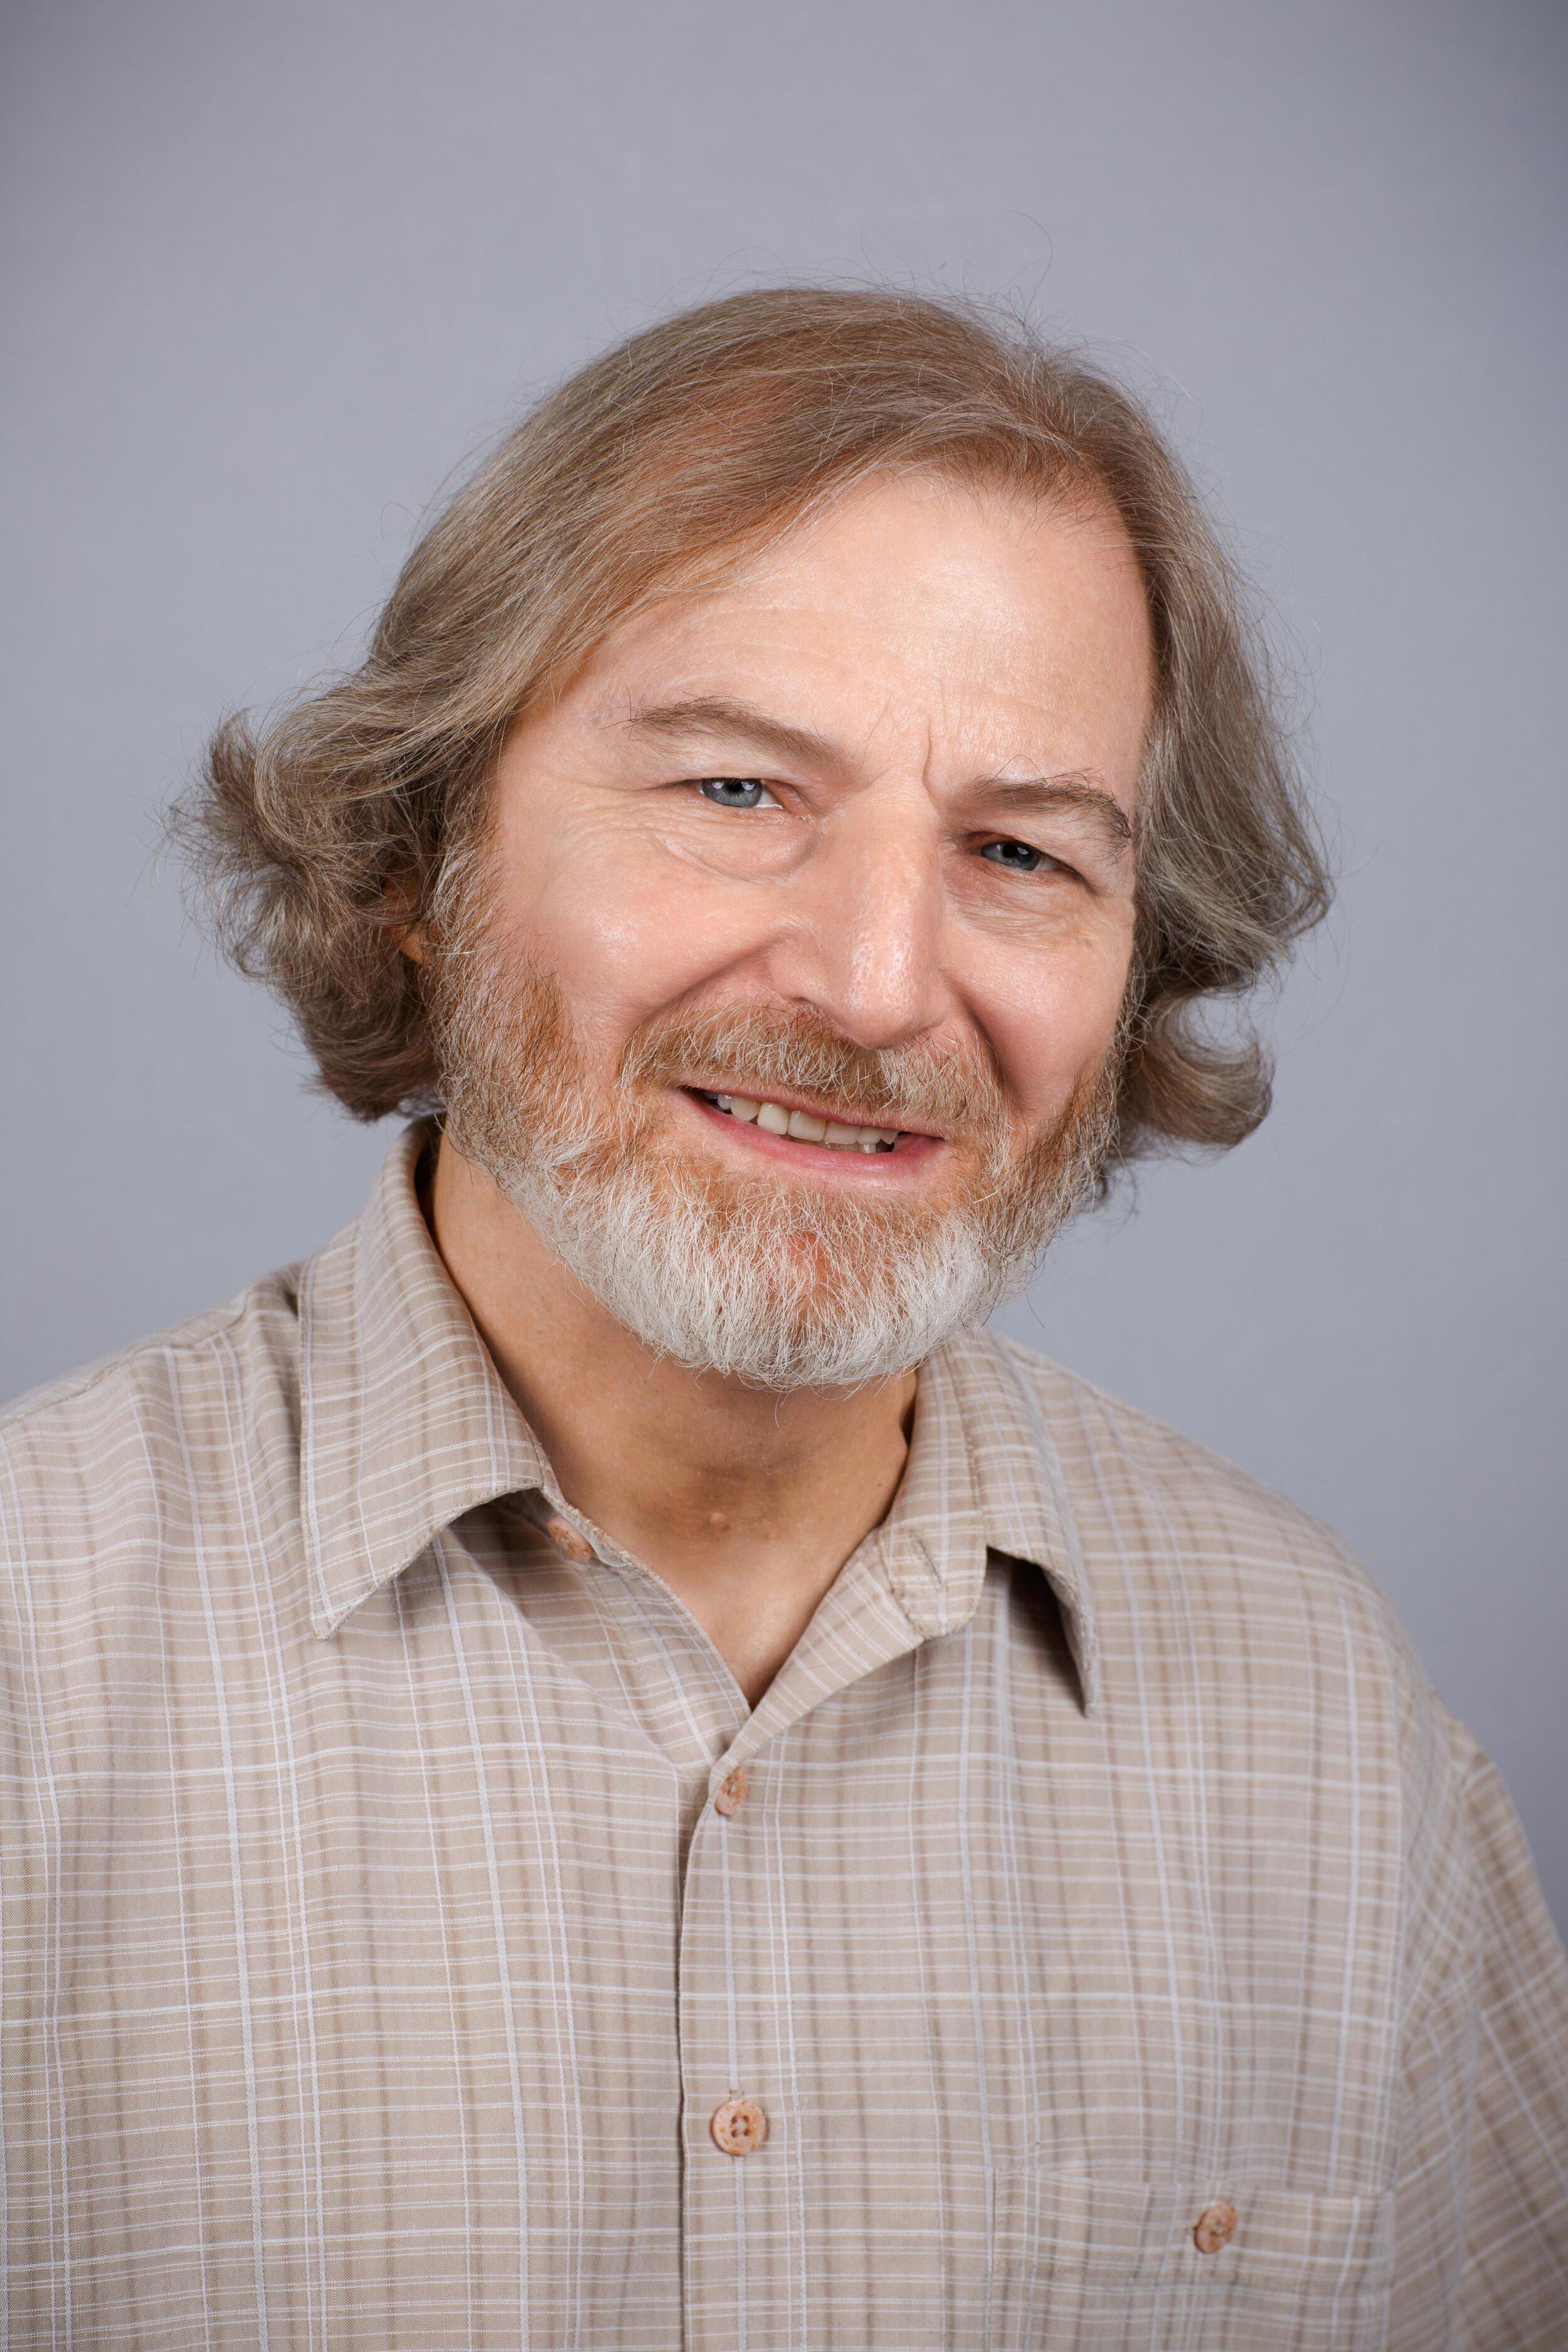 Jeff Burns